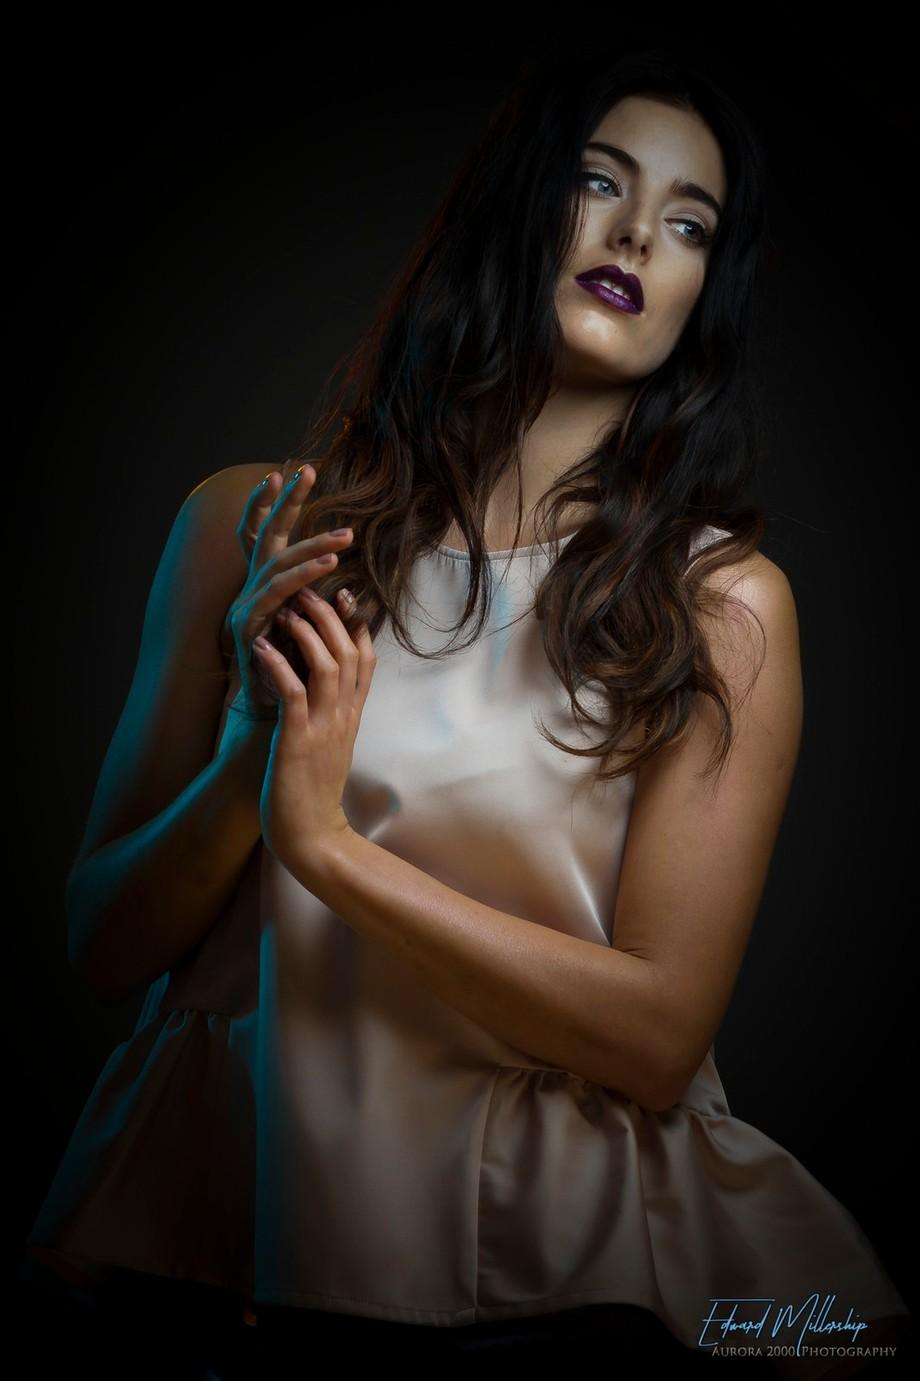 Demo Shot by EddieGremlin - Her In The Studio Photo Contest